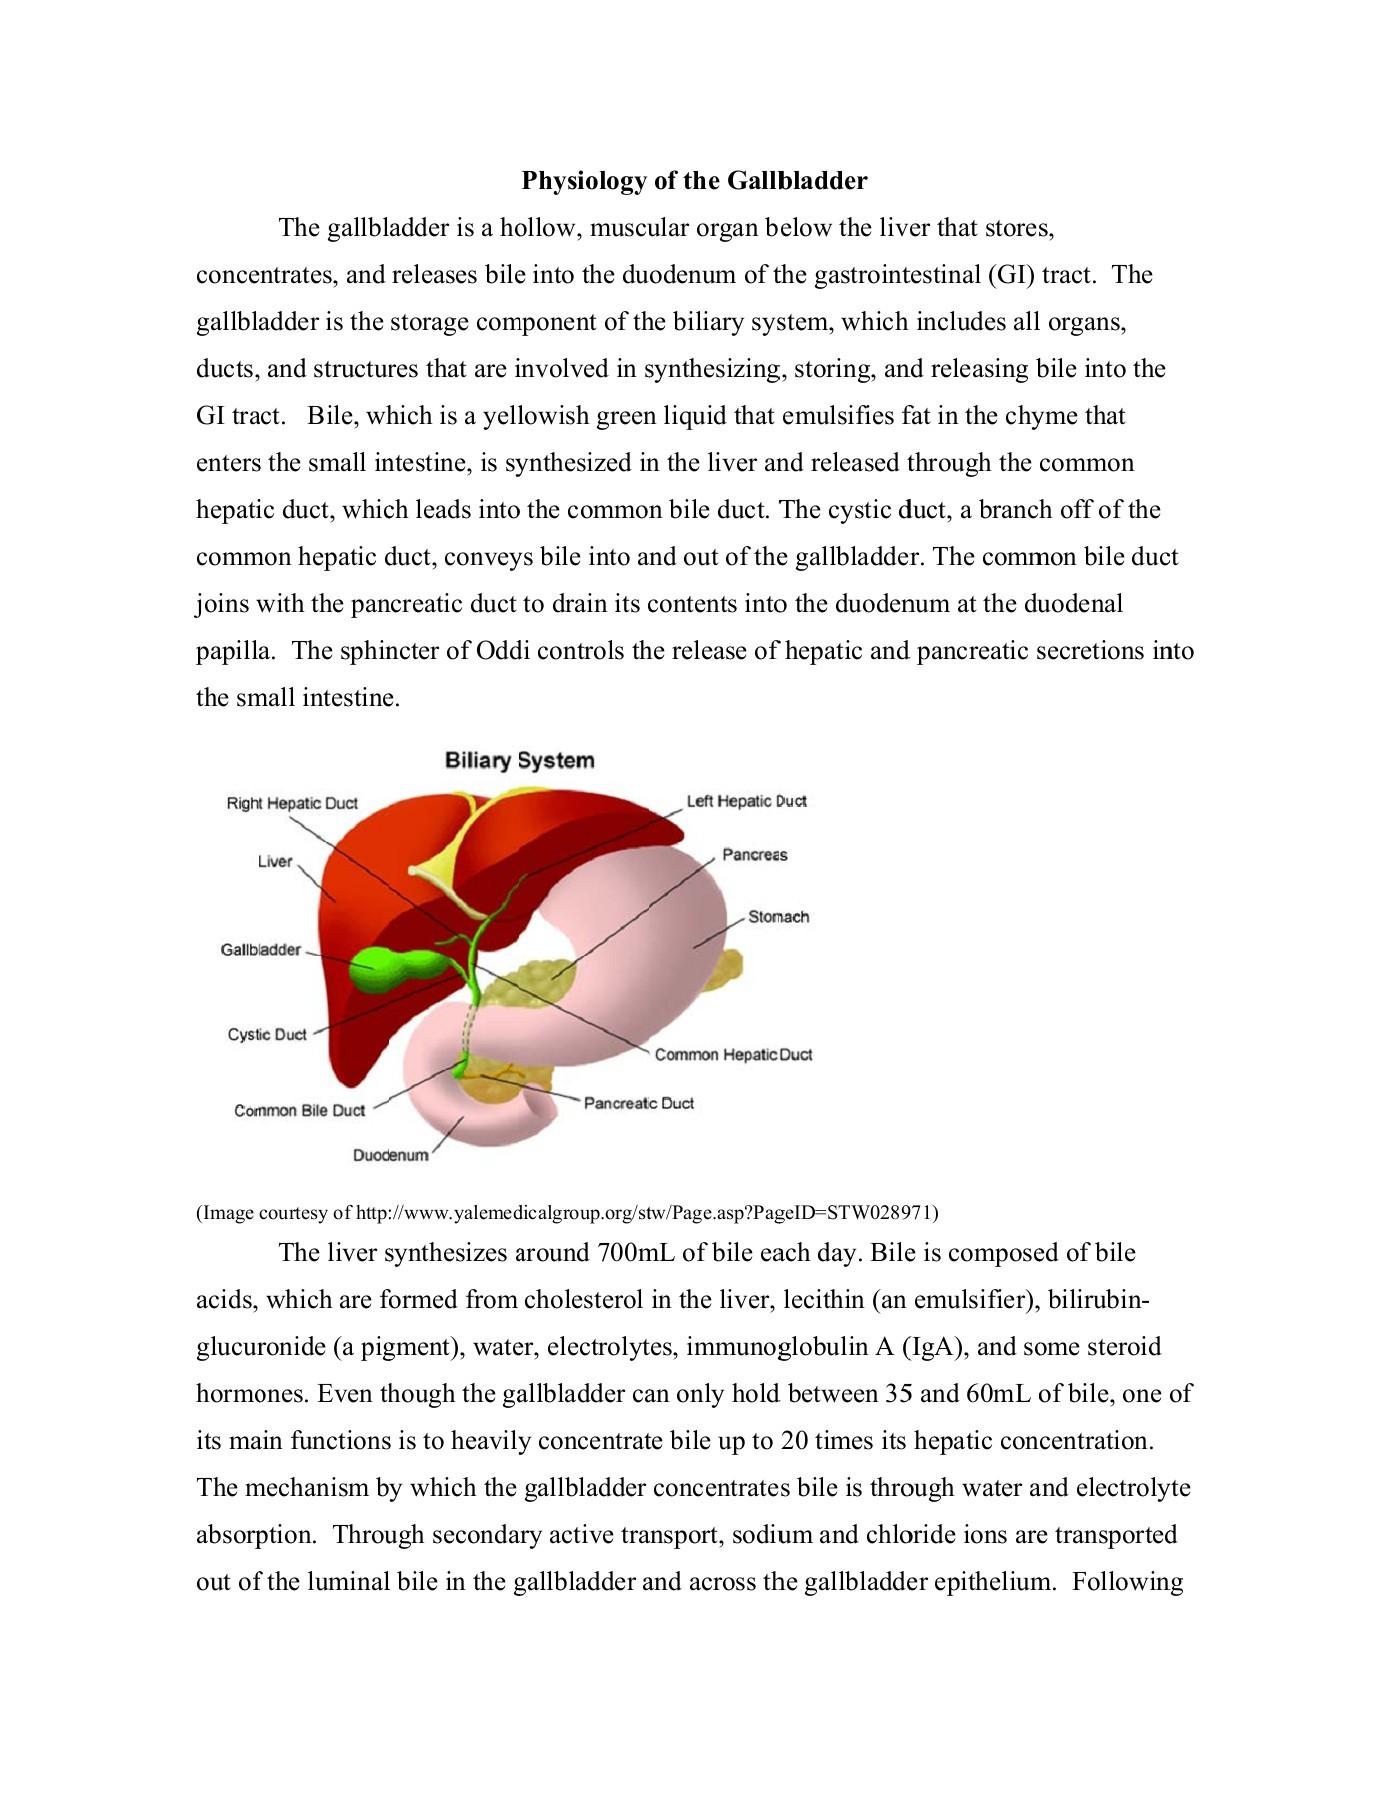 Physiology Of The Gallbladder Indiana University Fliphtml5